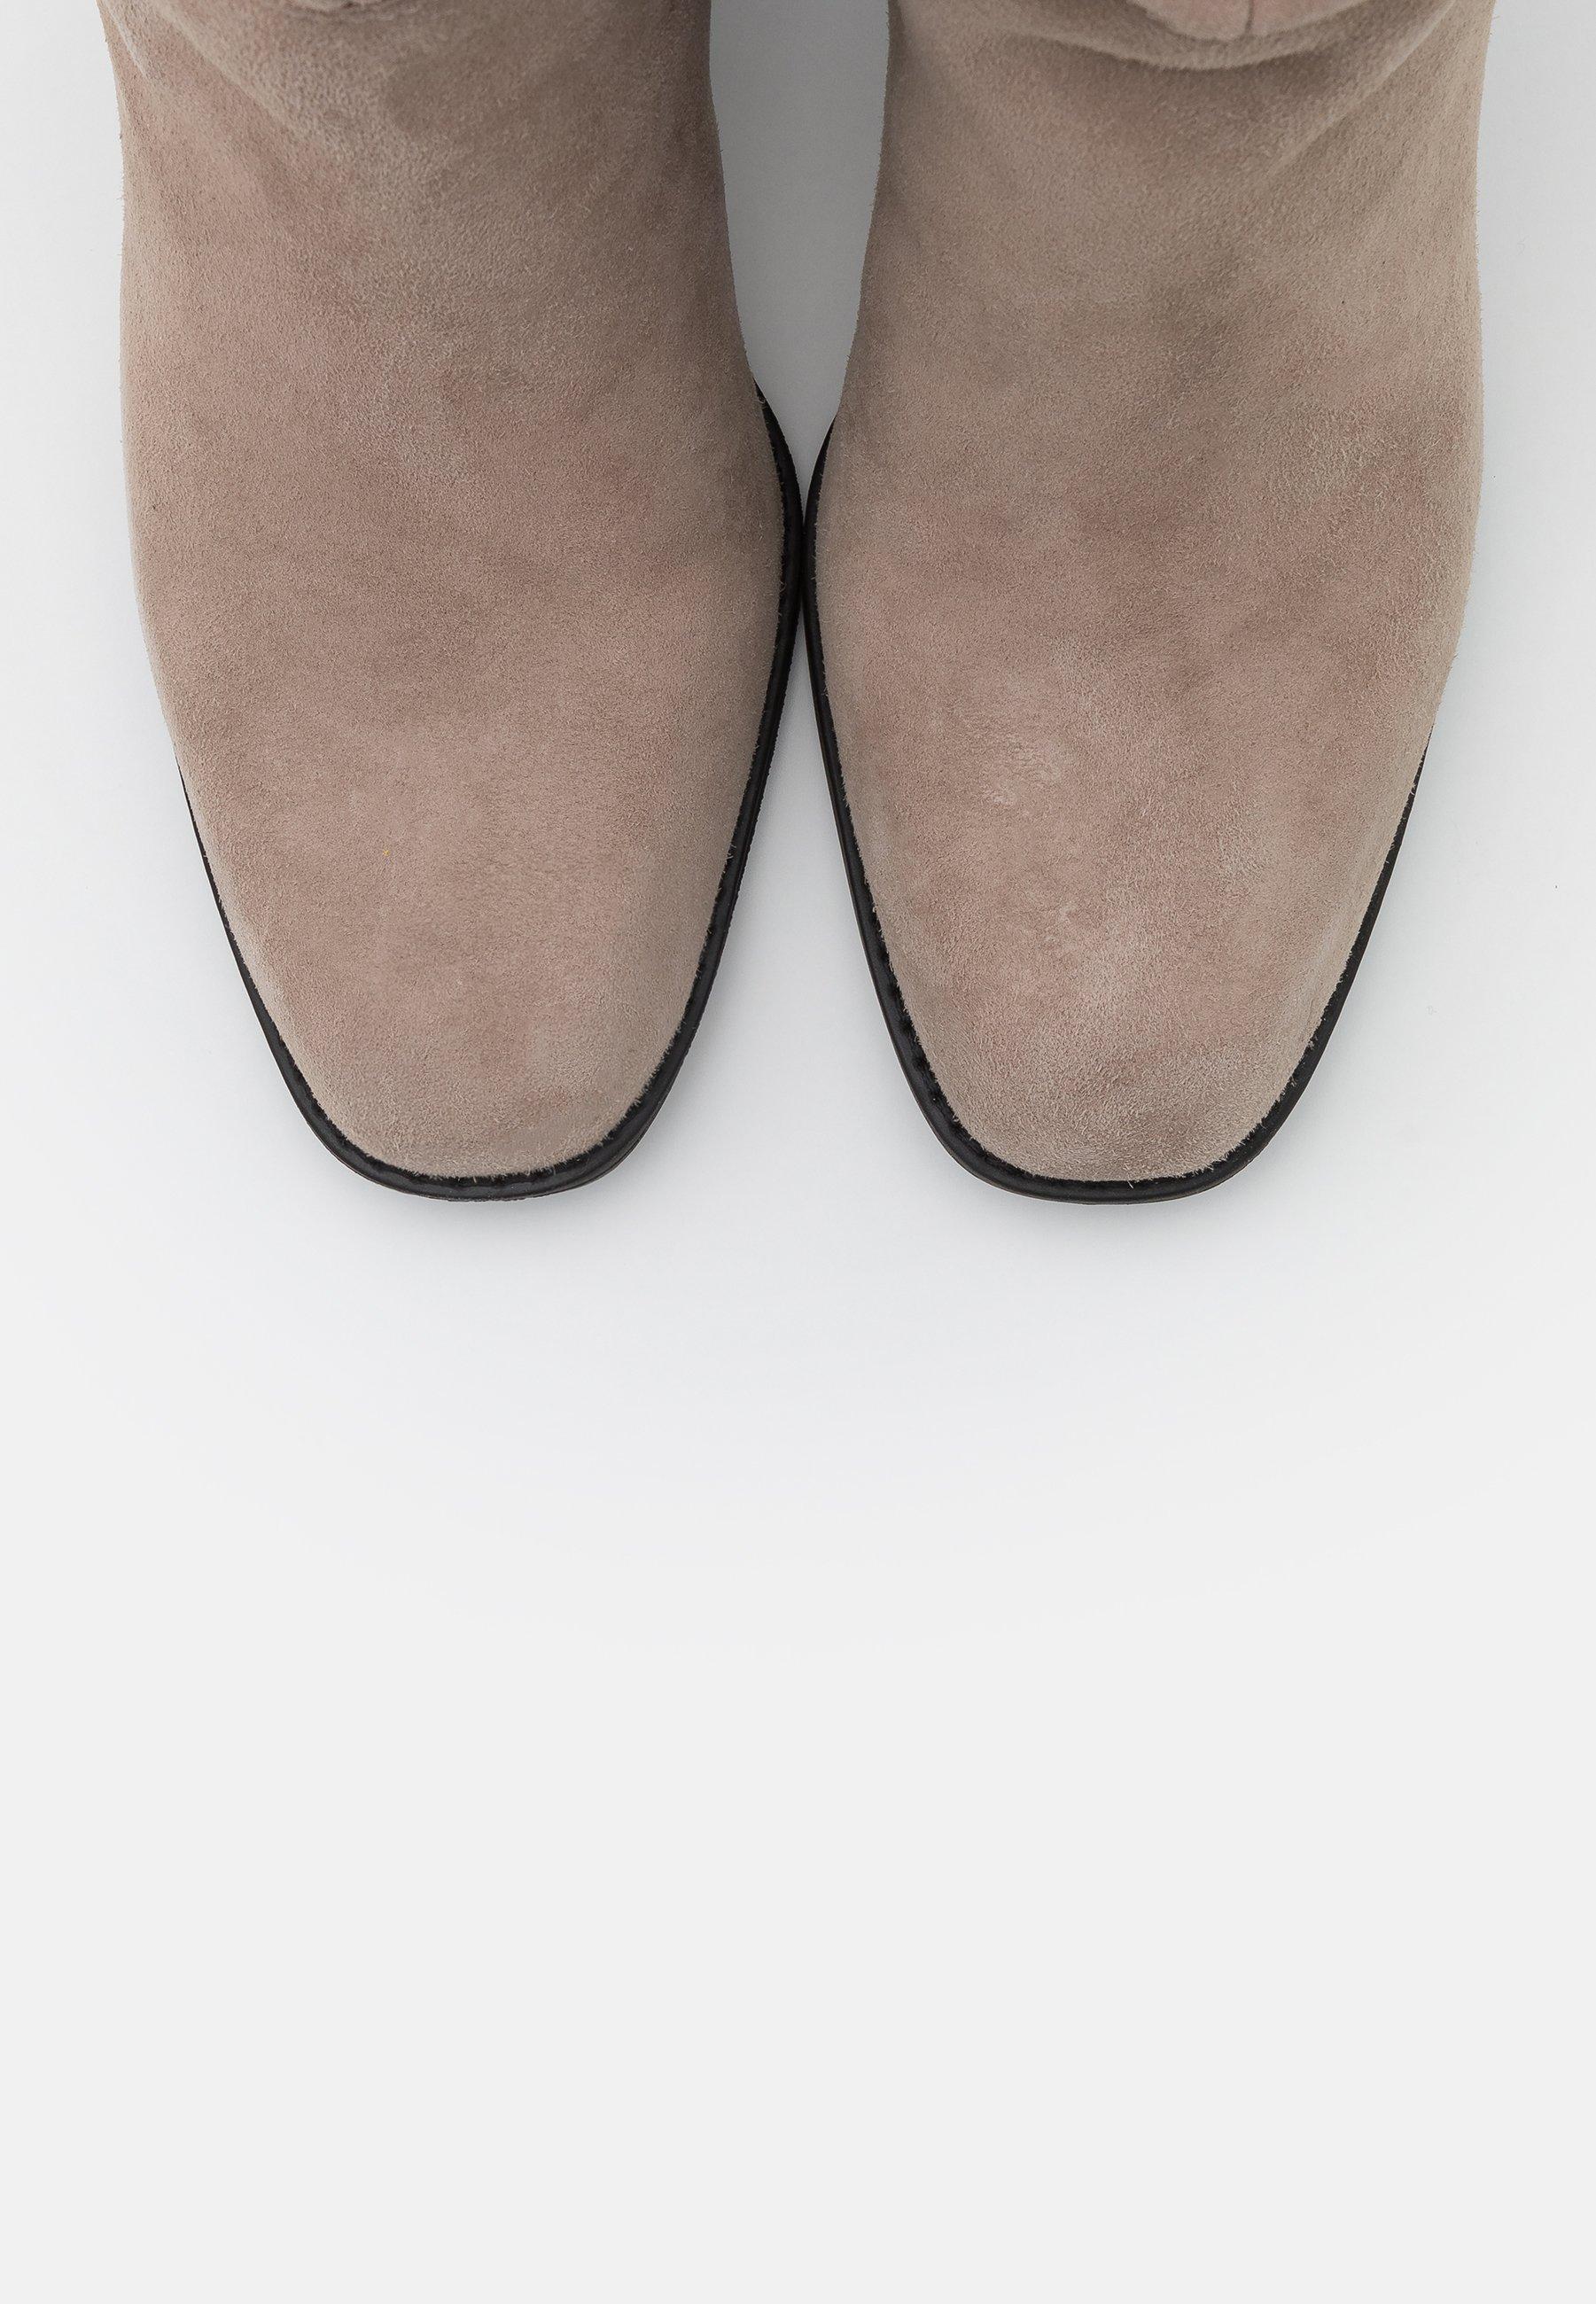 Tamaris Stiefel - Mud/taupe